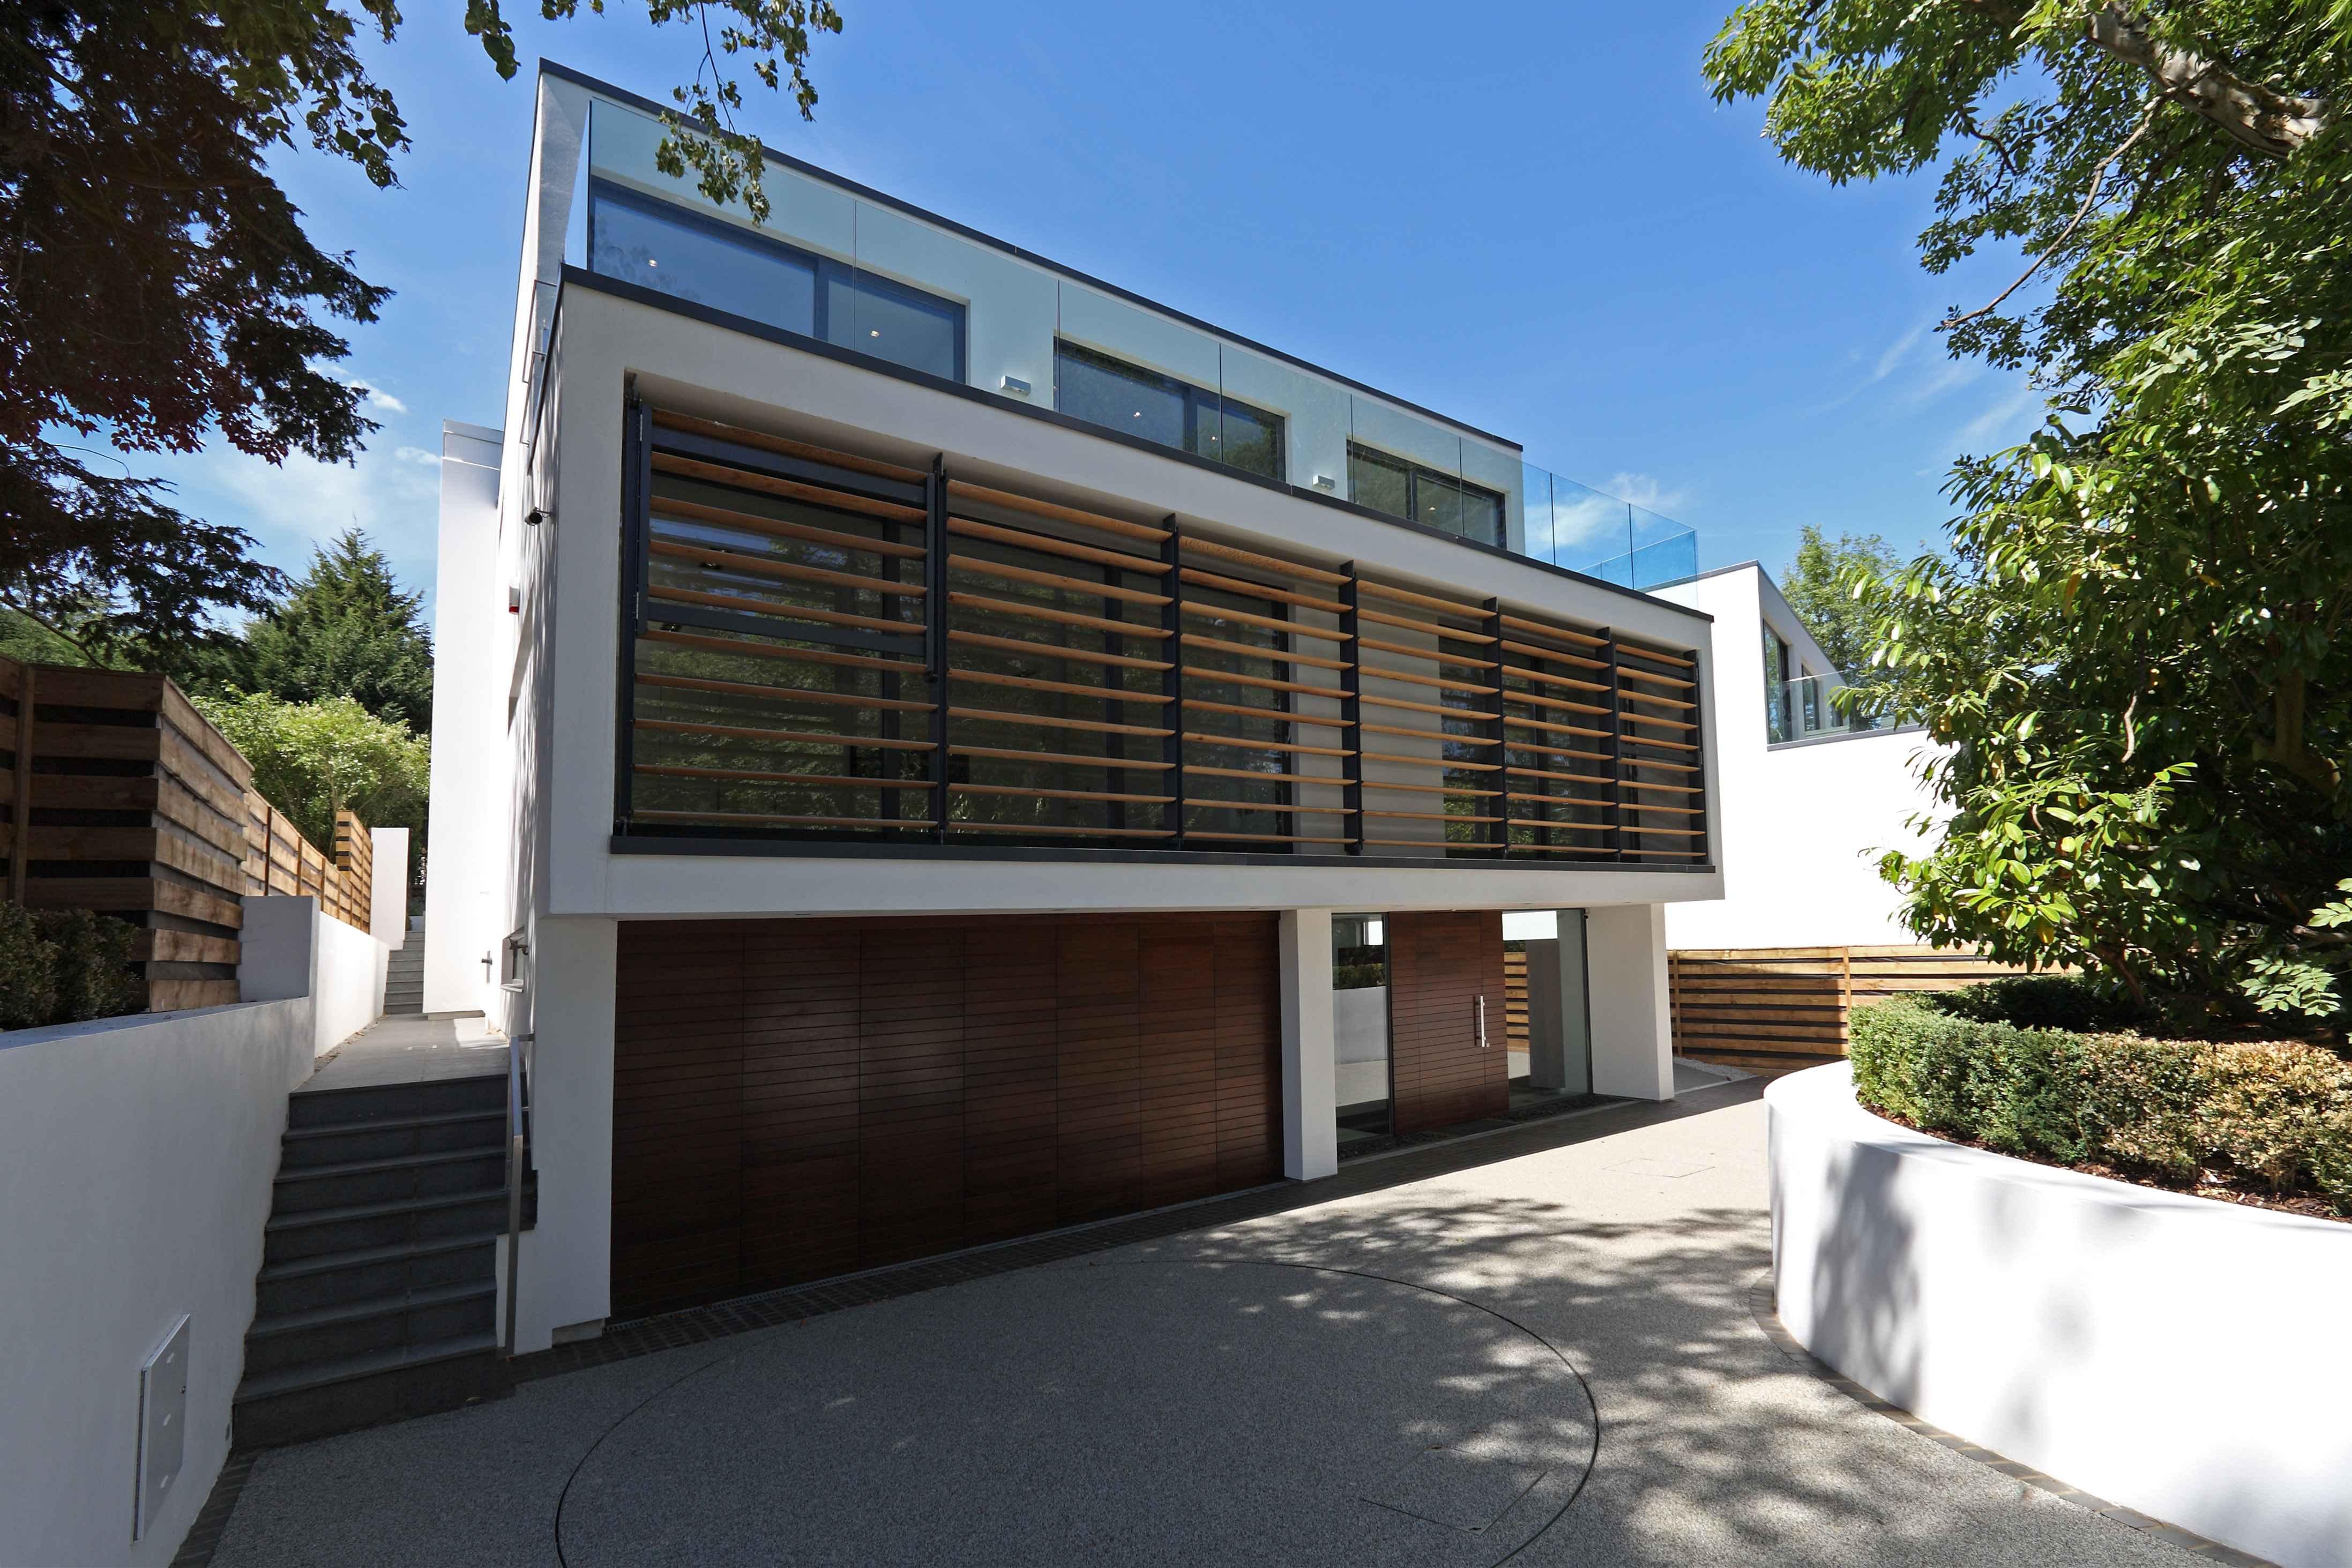 nicolas tye architects award winning architecture uk worldwide